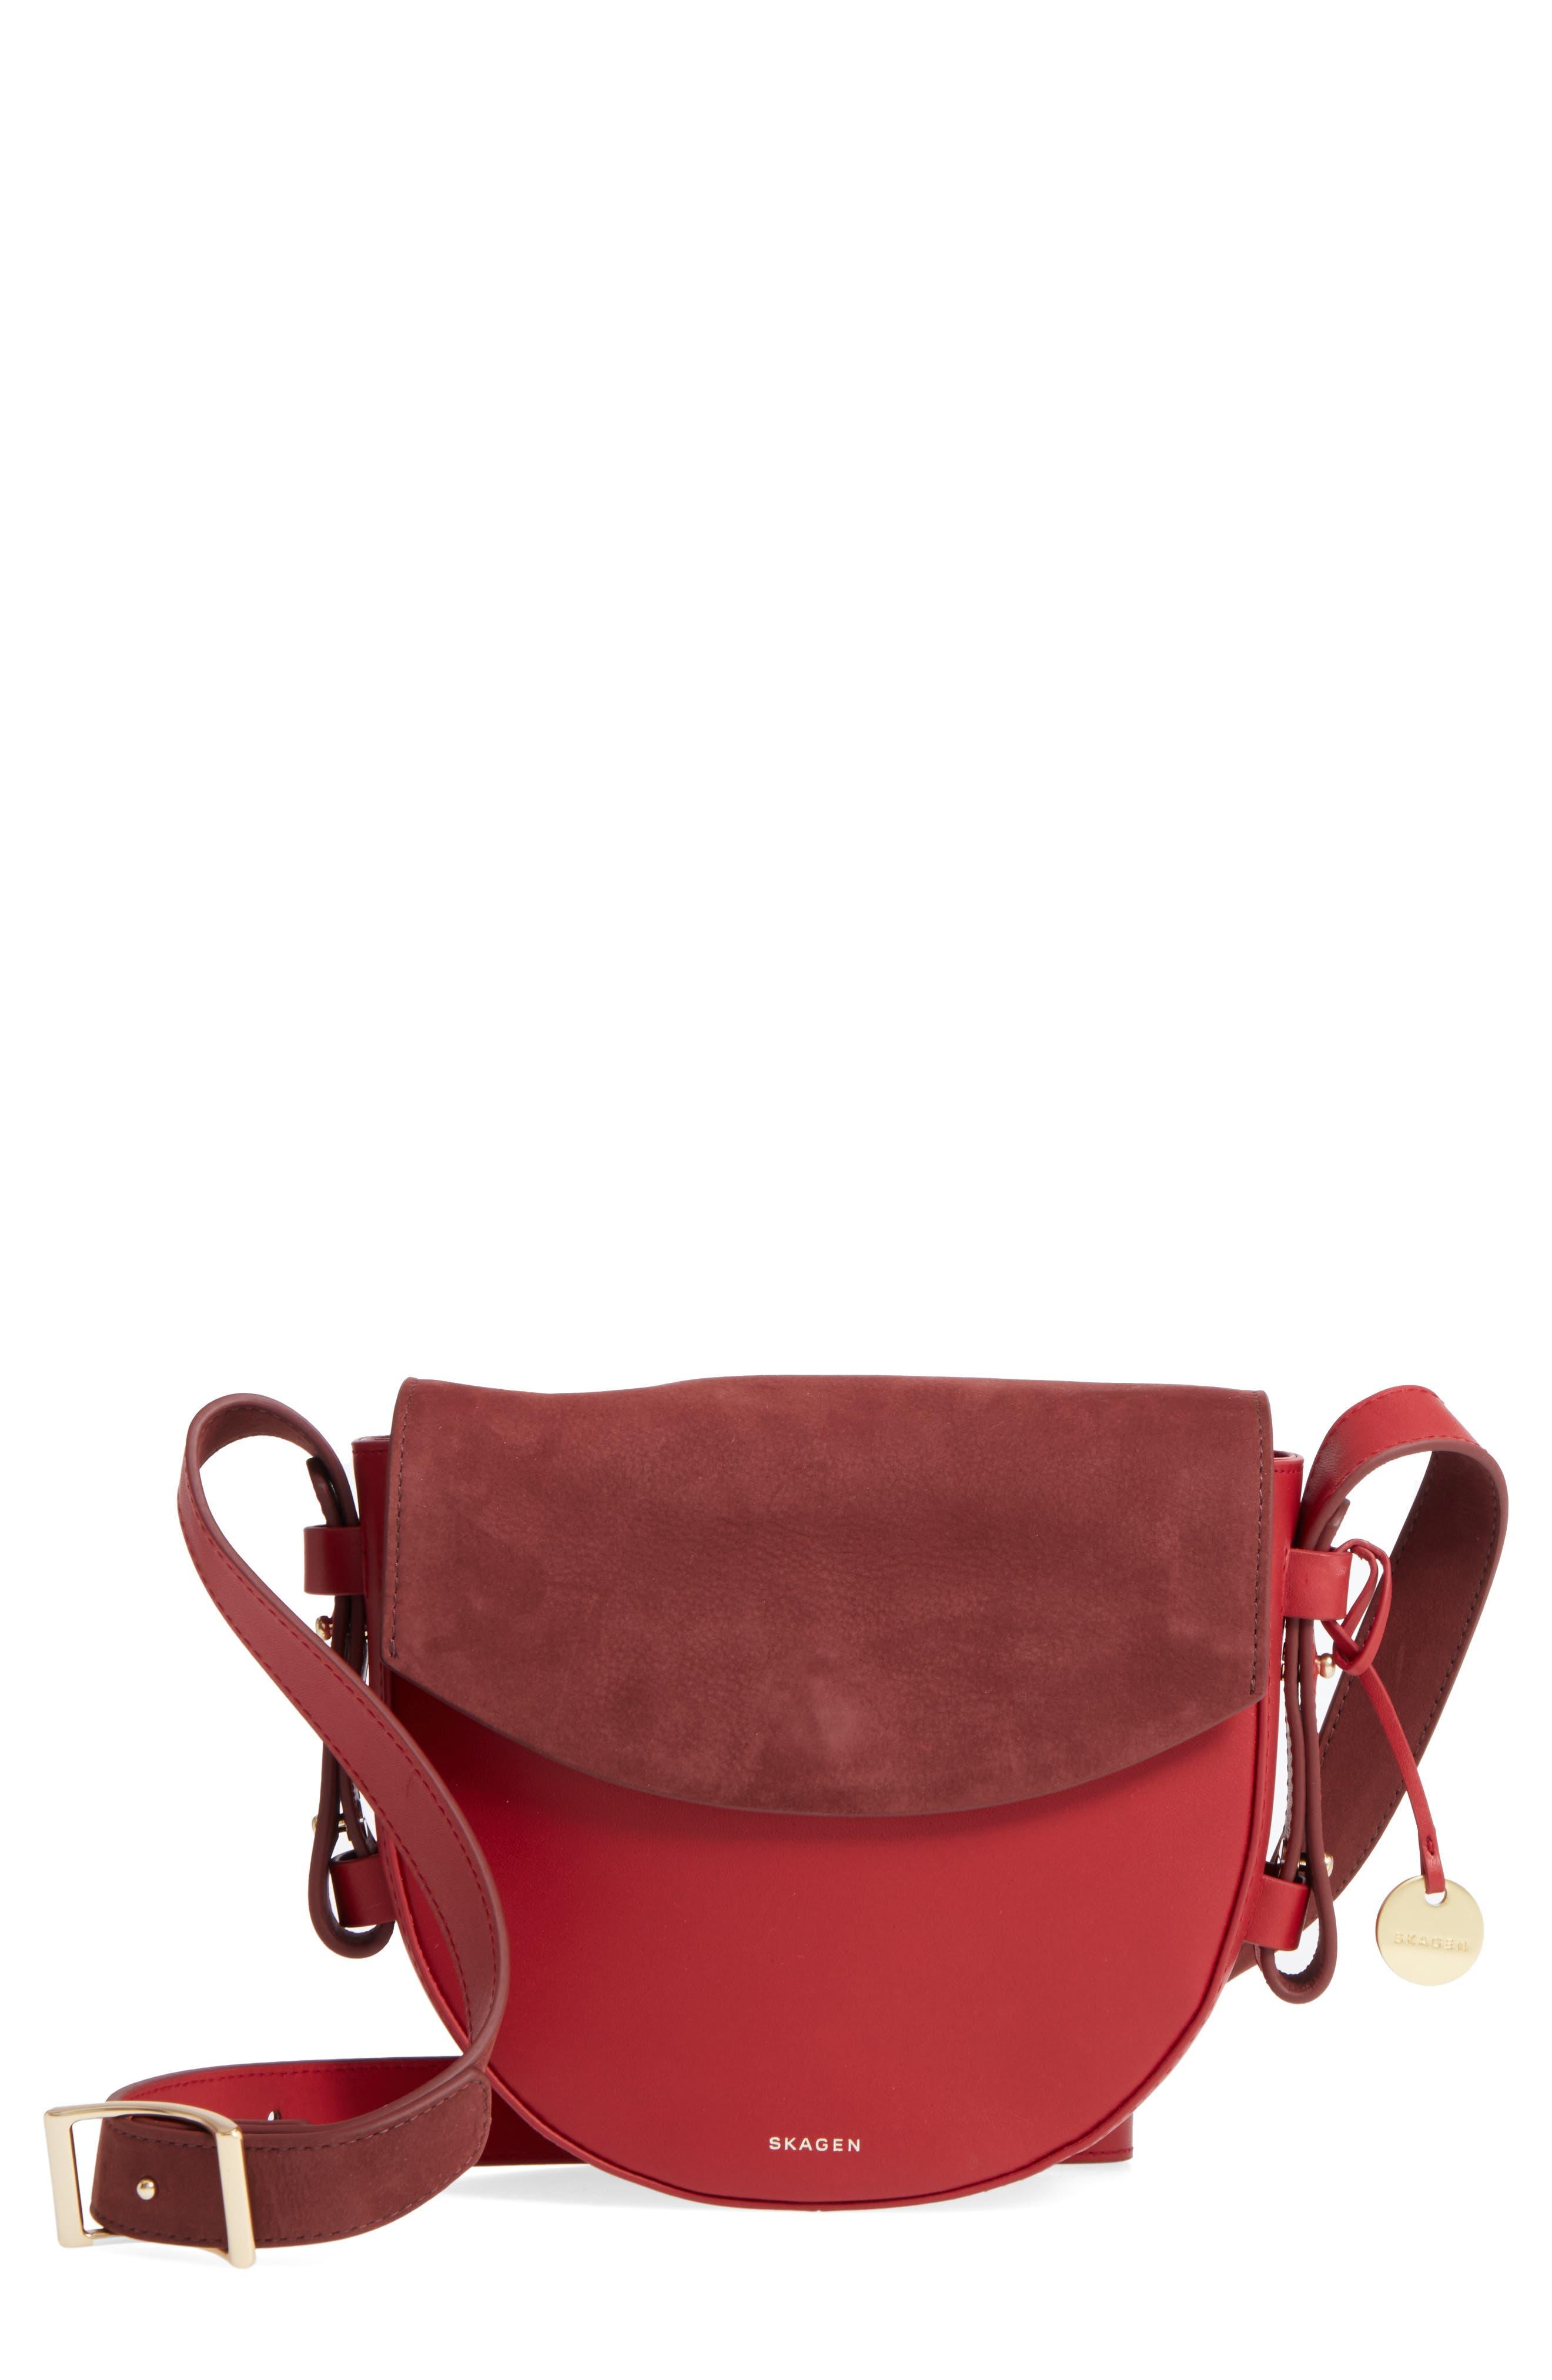 Skagen Lobelle Colorblock Leather & Suede Saddle Bag